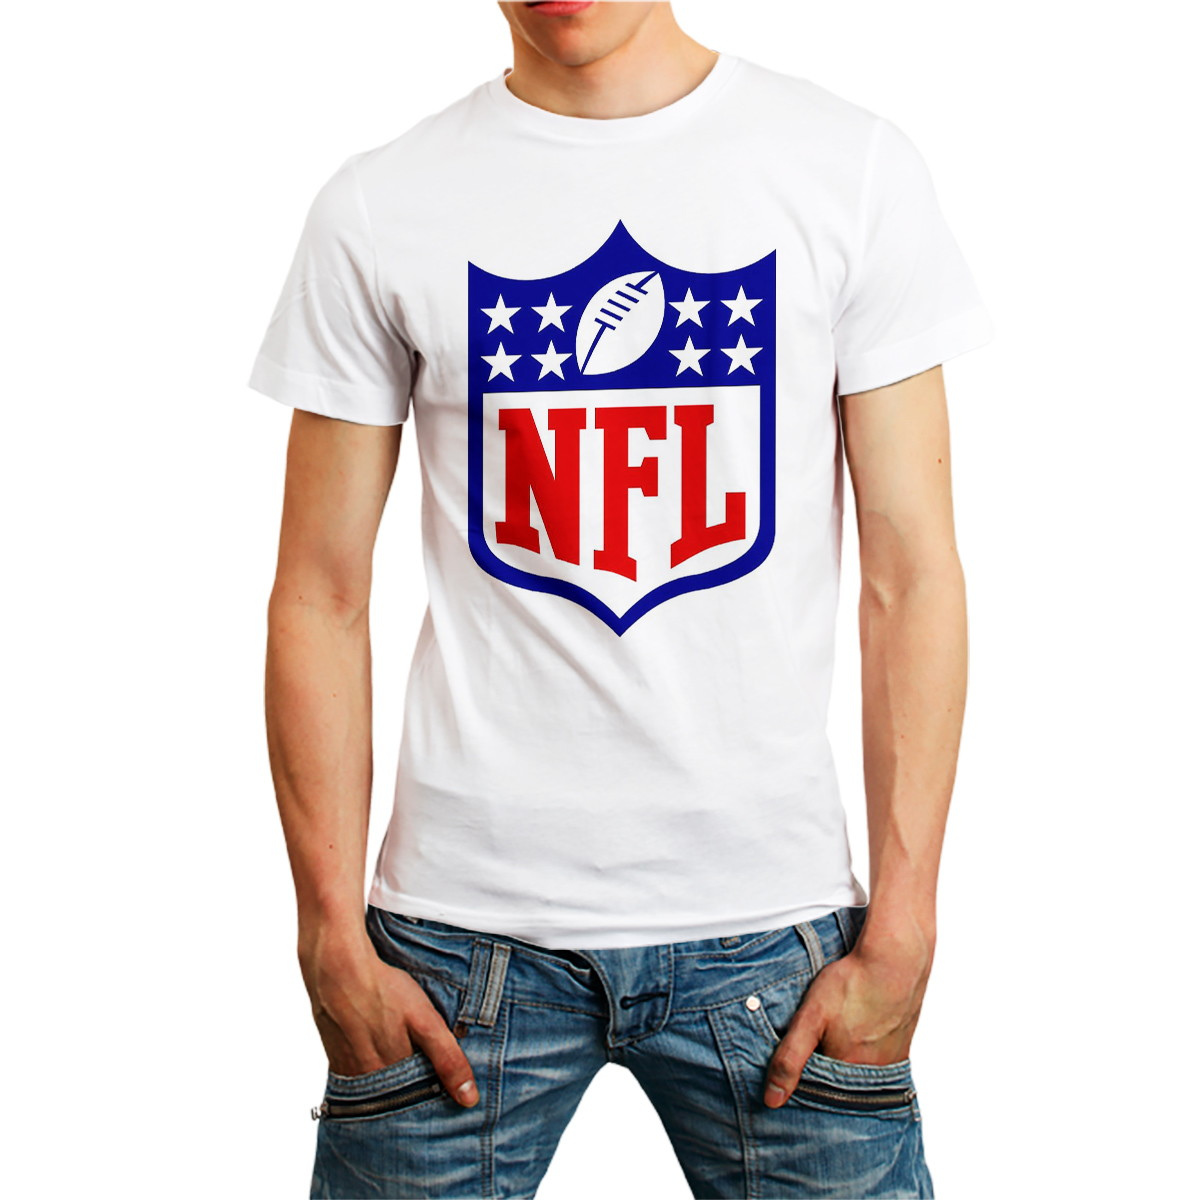 58281c59bc Camiseta NFL Camisa Futebol Americano Roupa homem Branca no Elo7 ...